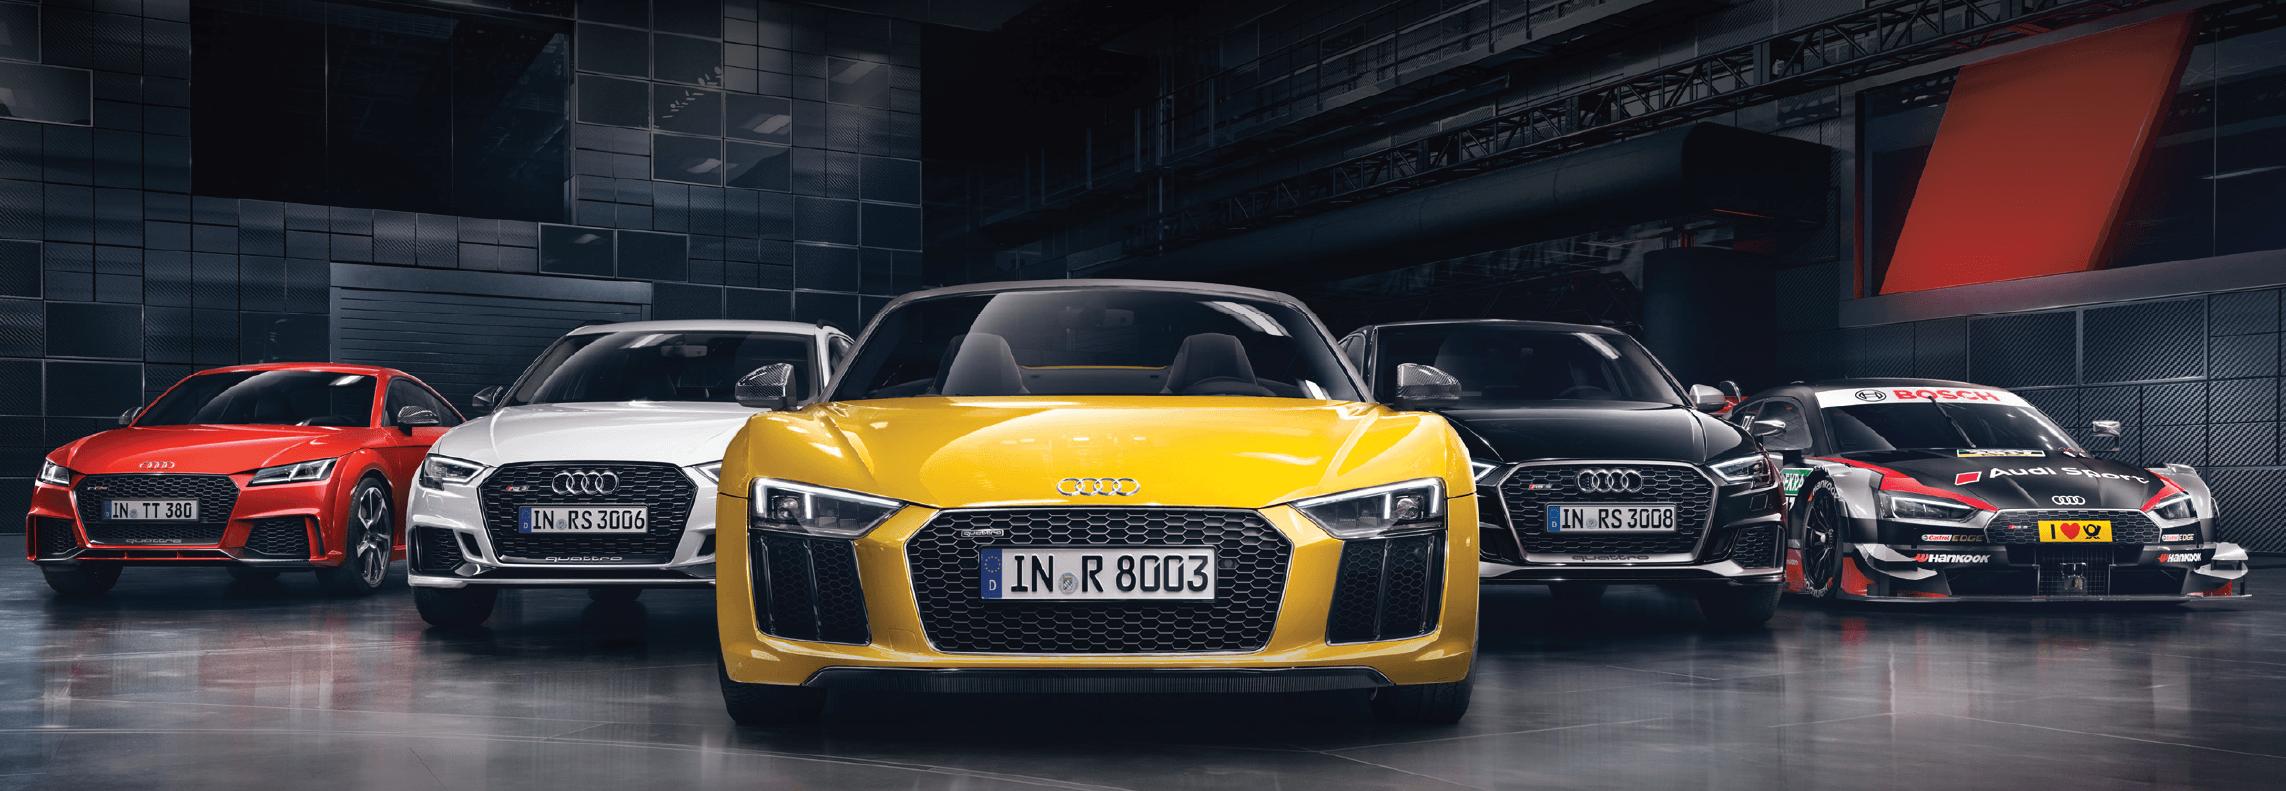 Audi Sport Tour (Main Image) 3